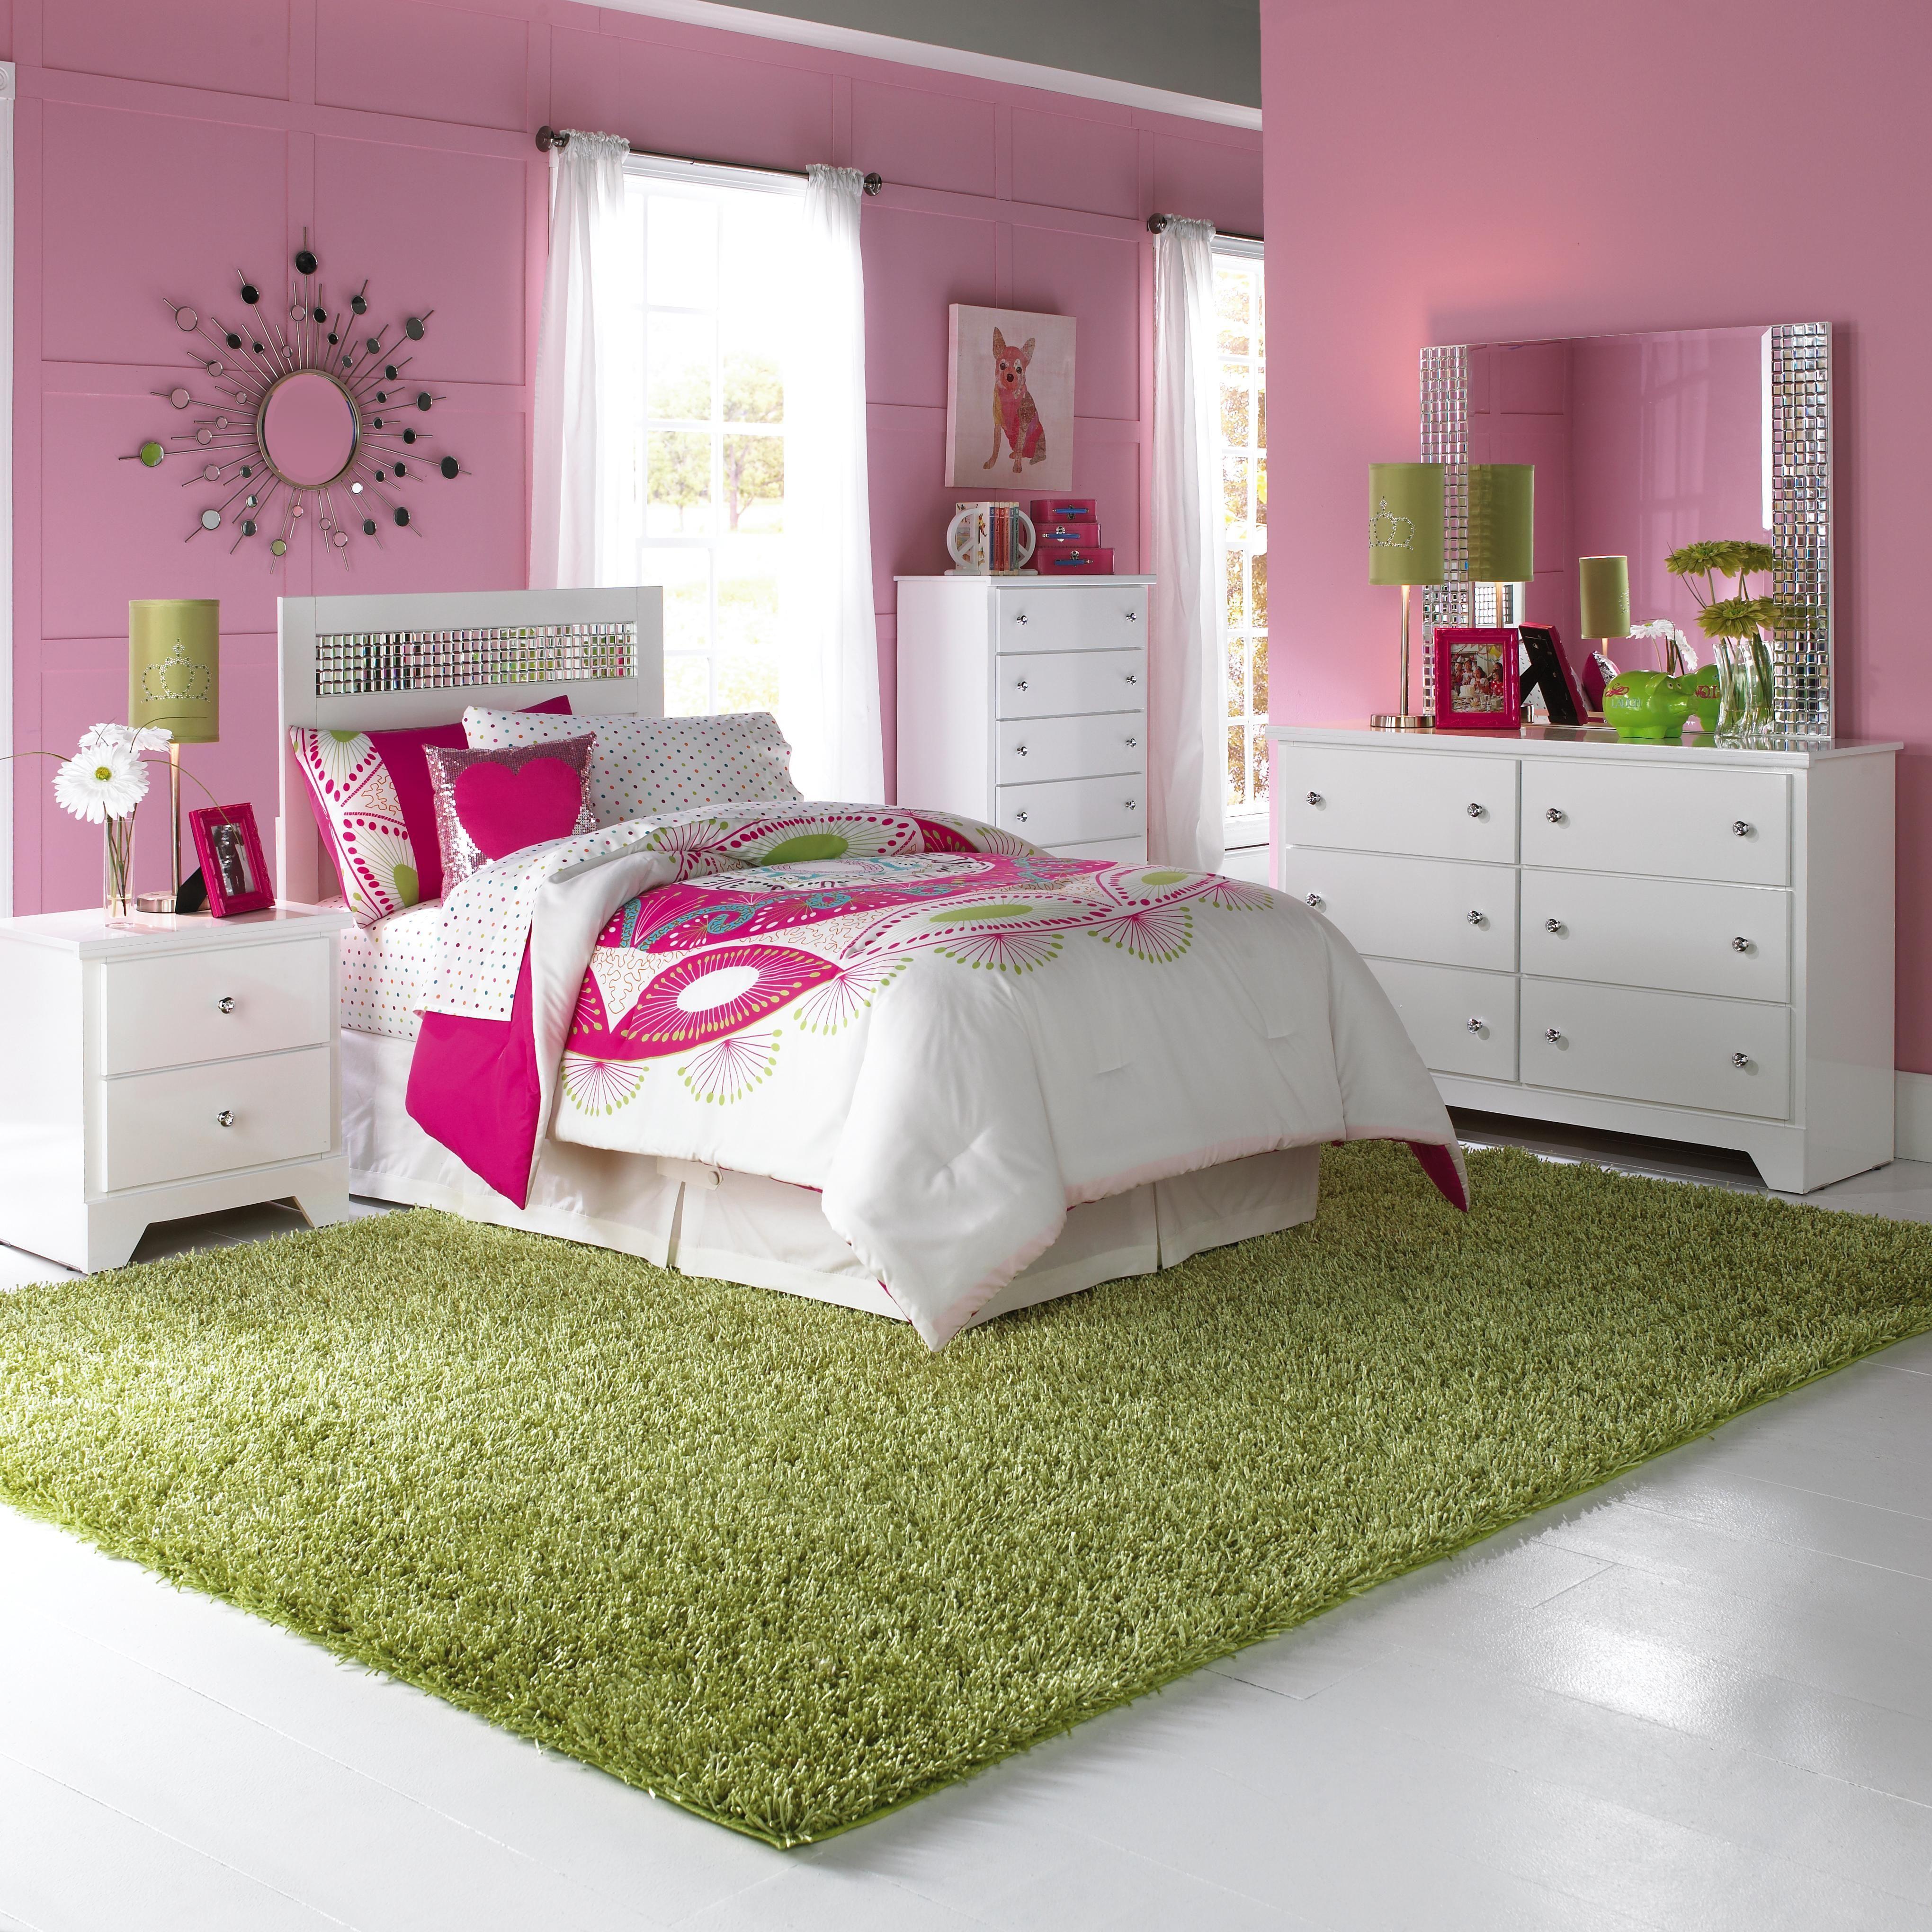 Badcock Furniture Marilyn Twin Bedroom badcockfurniture